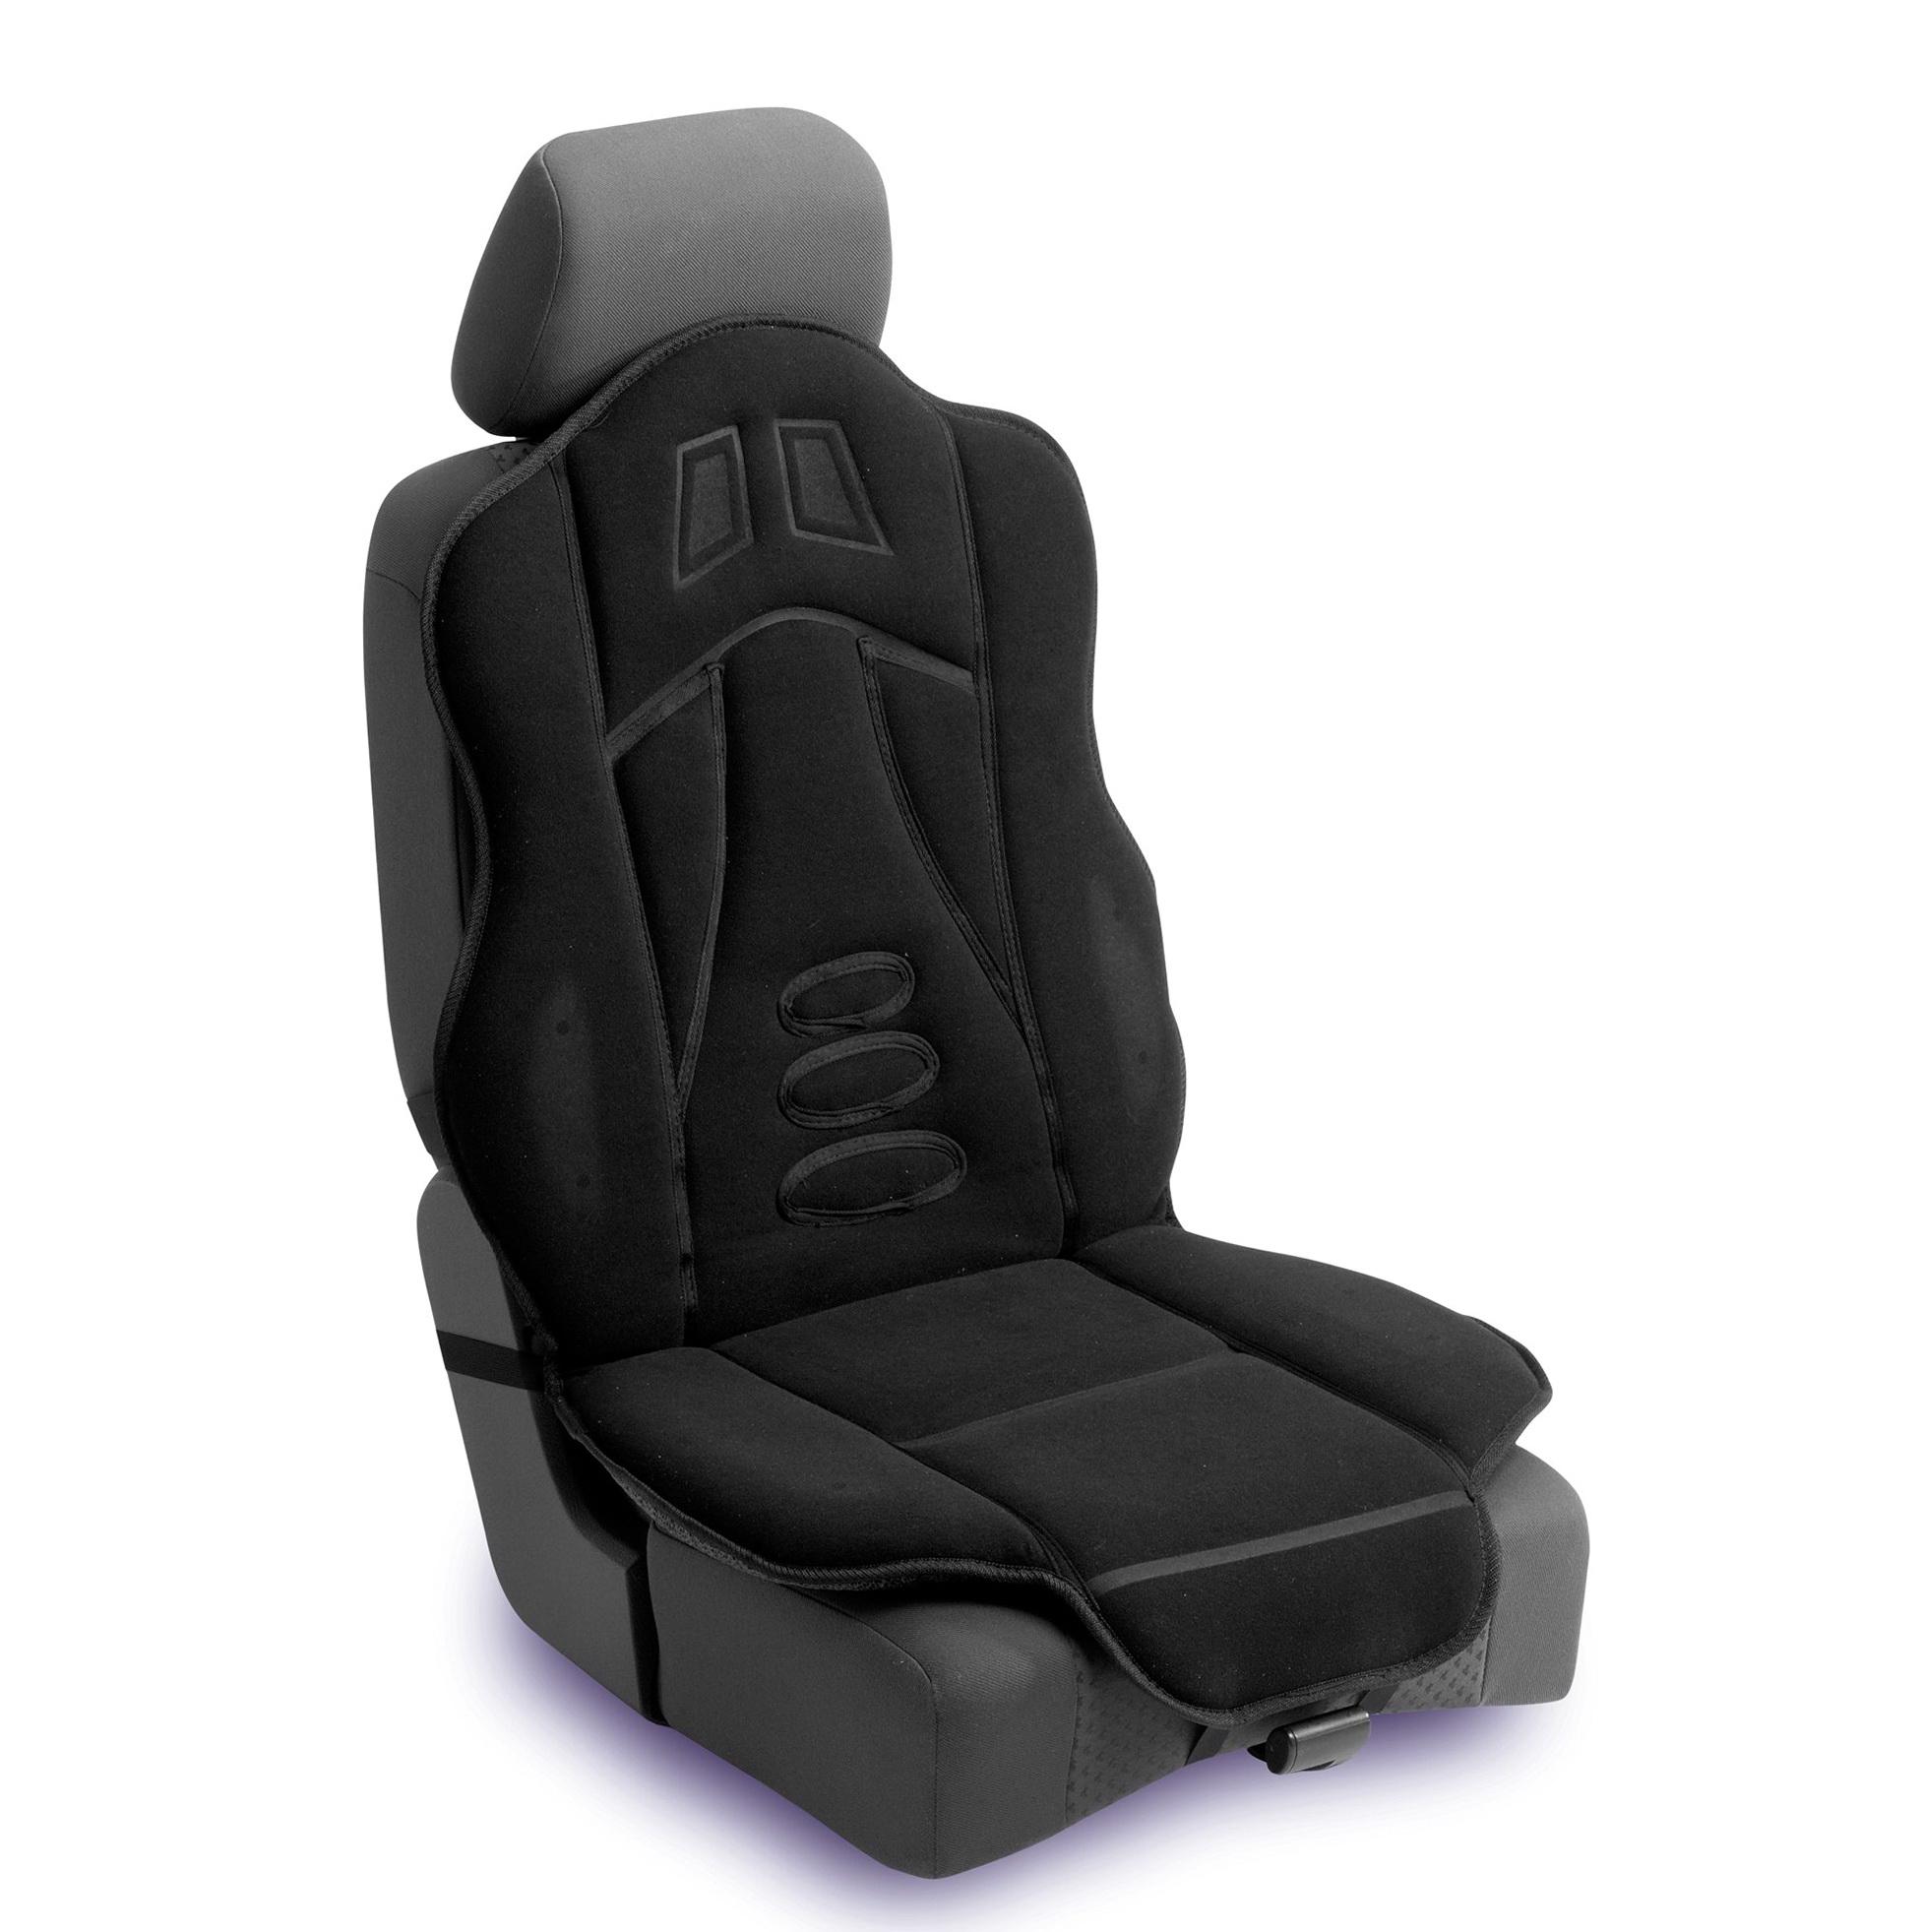 Ergonomic Car Seat Cushion Back Support Home Design Ideas